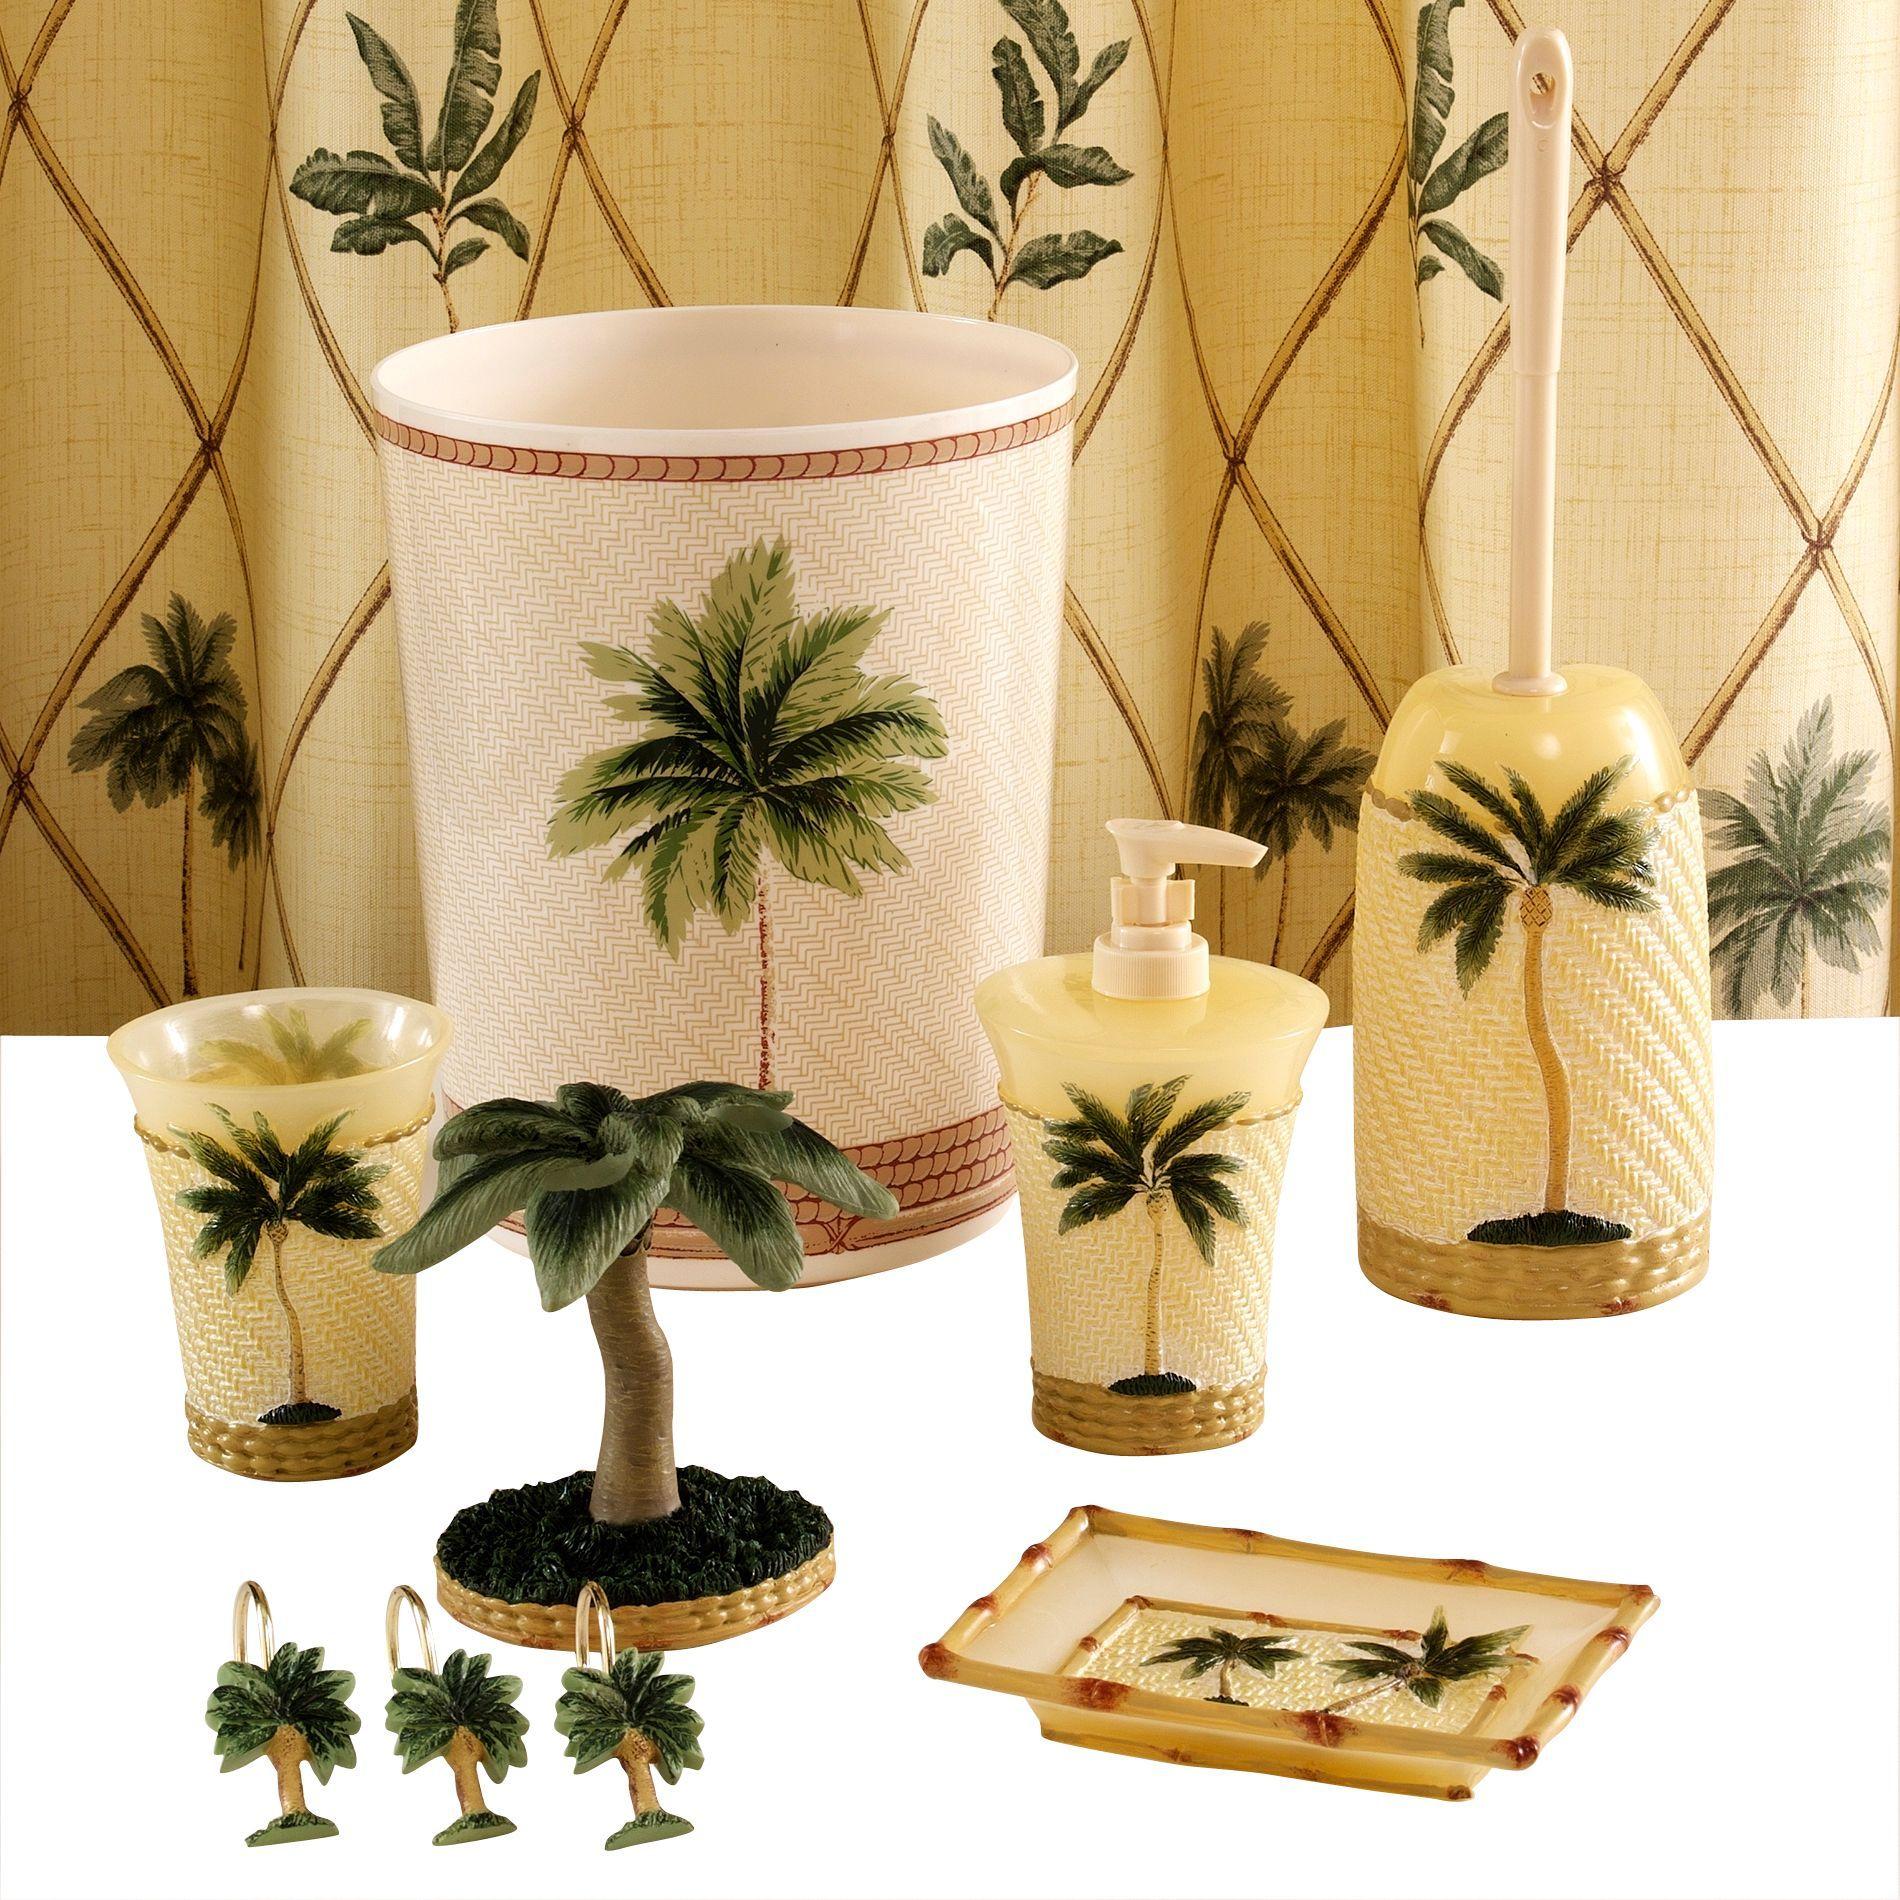 Palm Tree Bathroom Decor In 2020 Palm Tree Bathroom Decor Palm